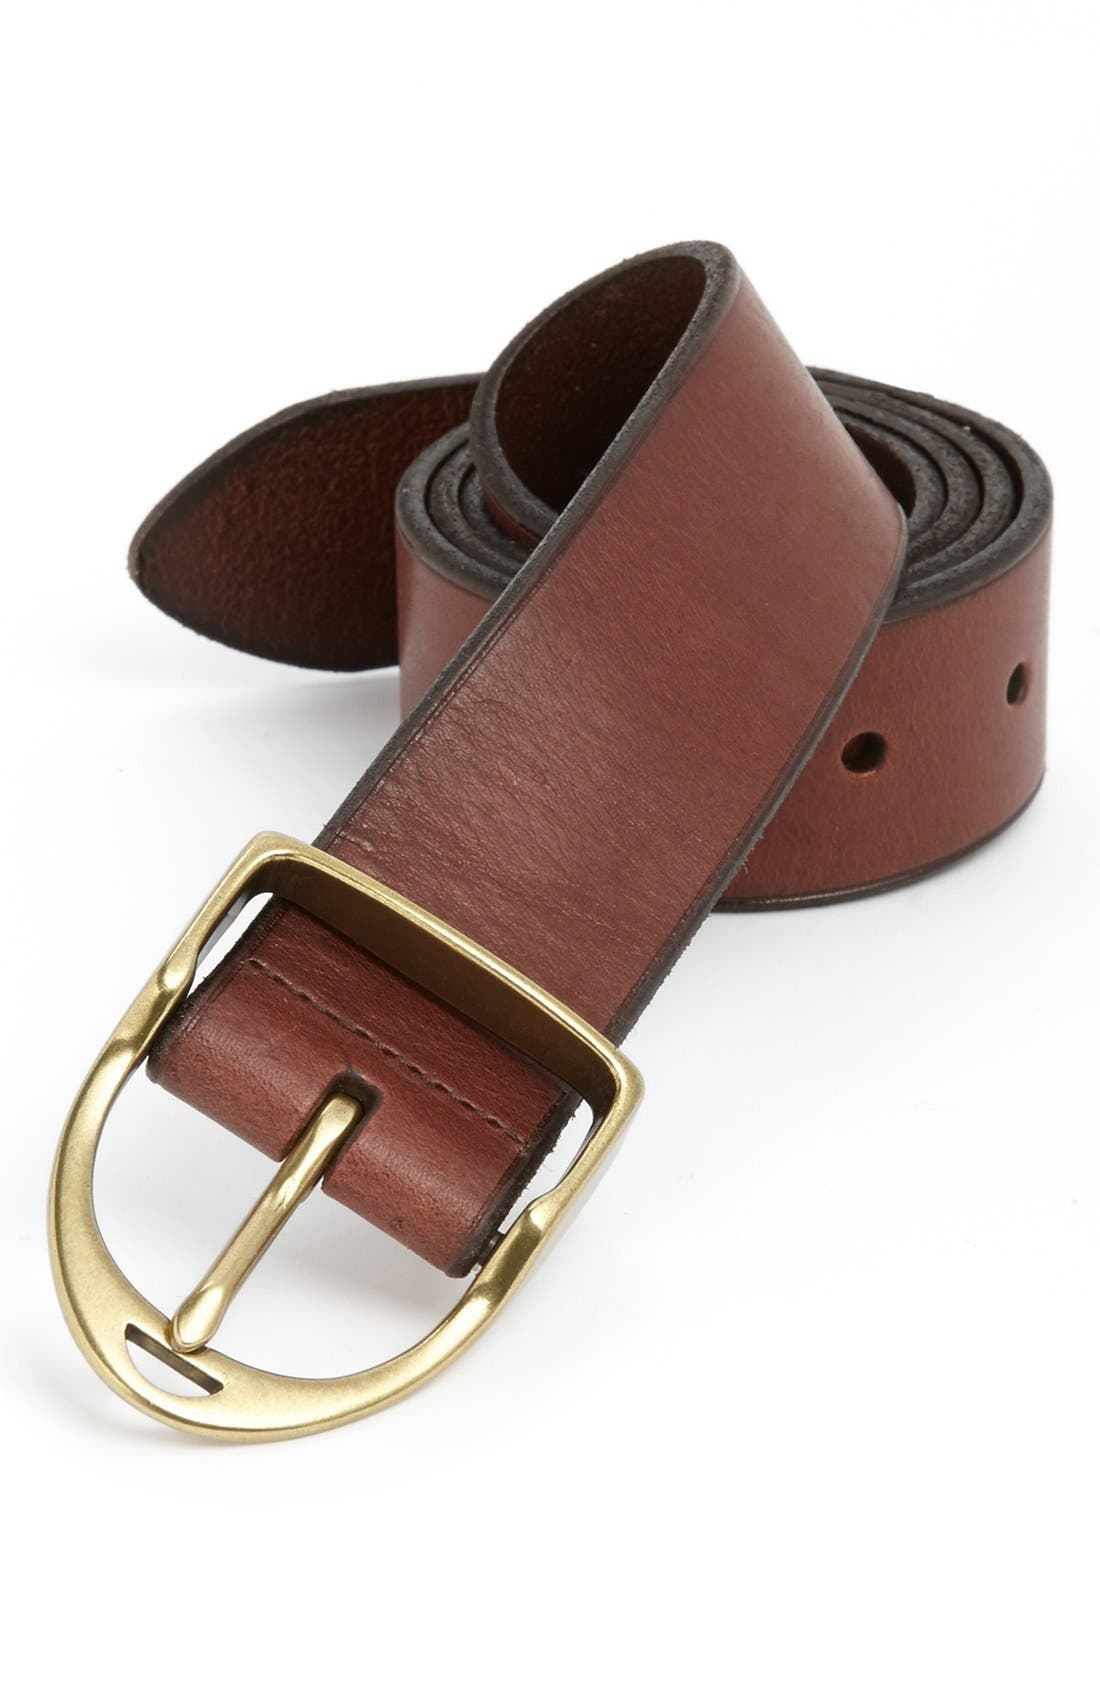 Main Image - Polo Ralph Lauren 'Wilton' Belt